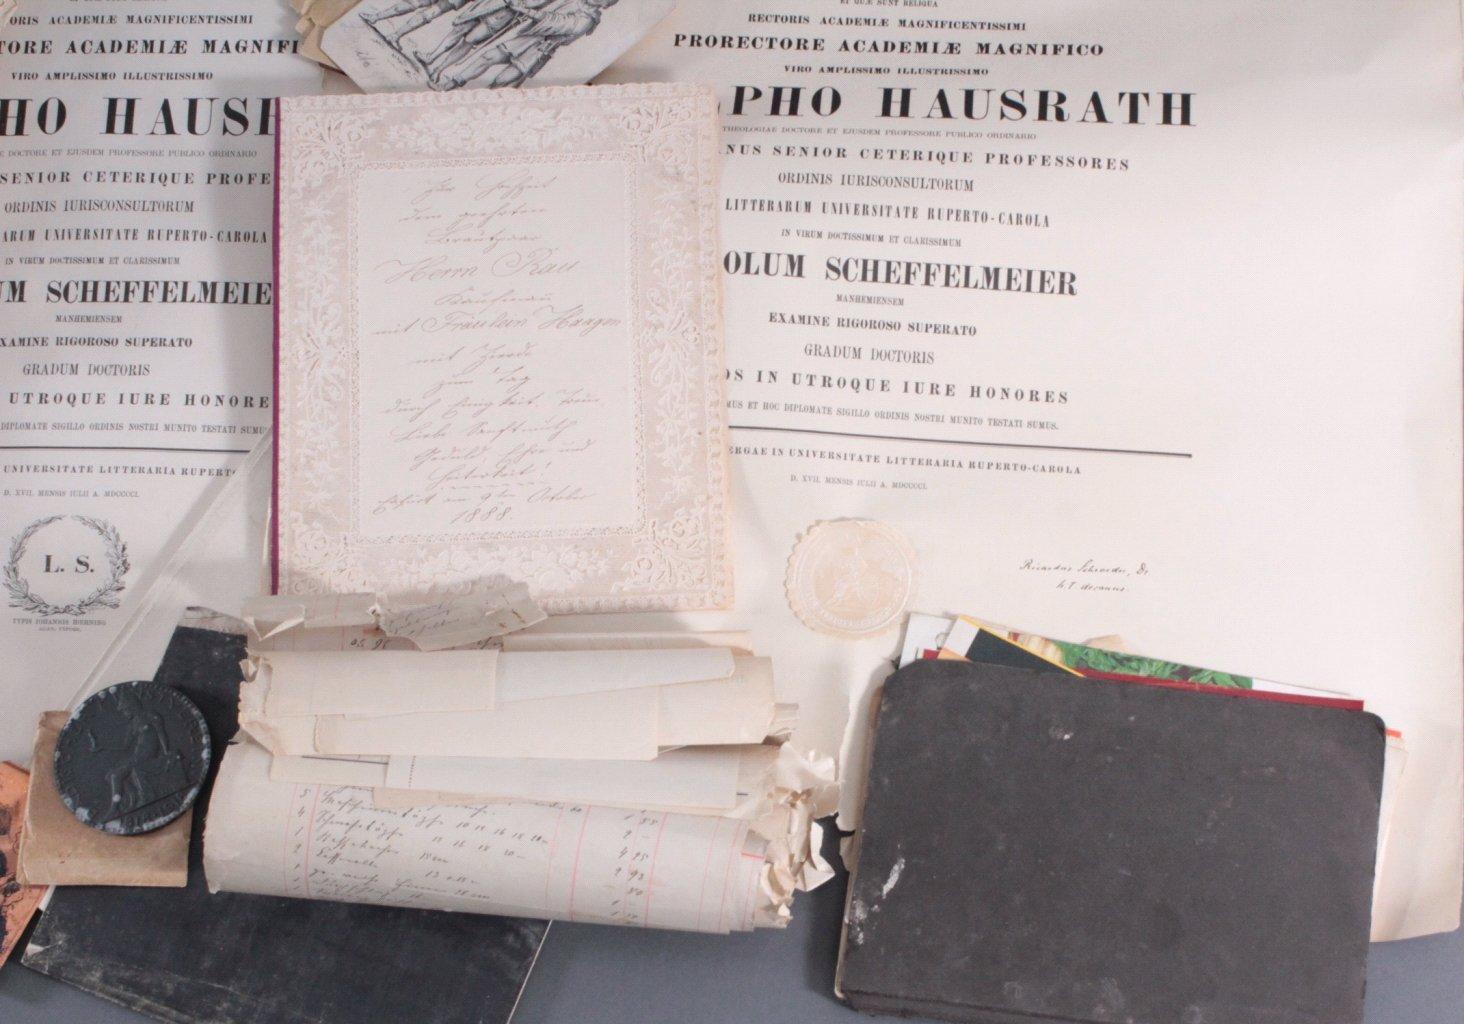 Großer  Papier und Dokumentennachlass , Karton prall gefüllt-6